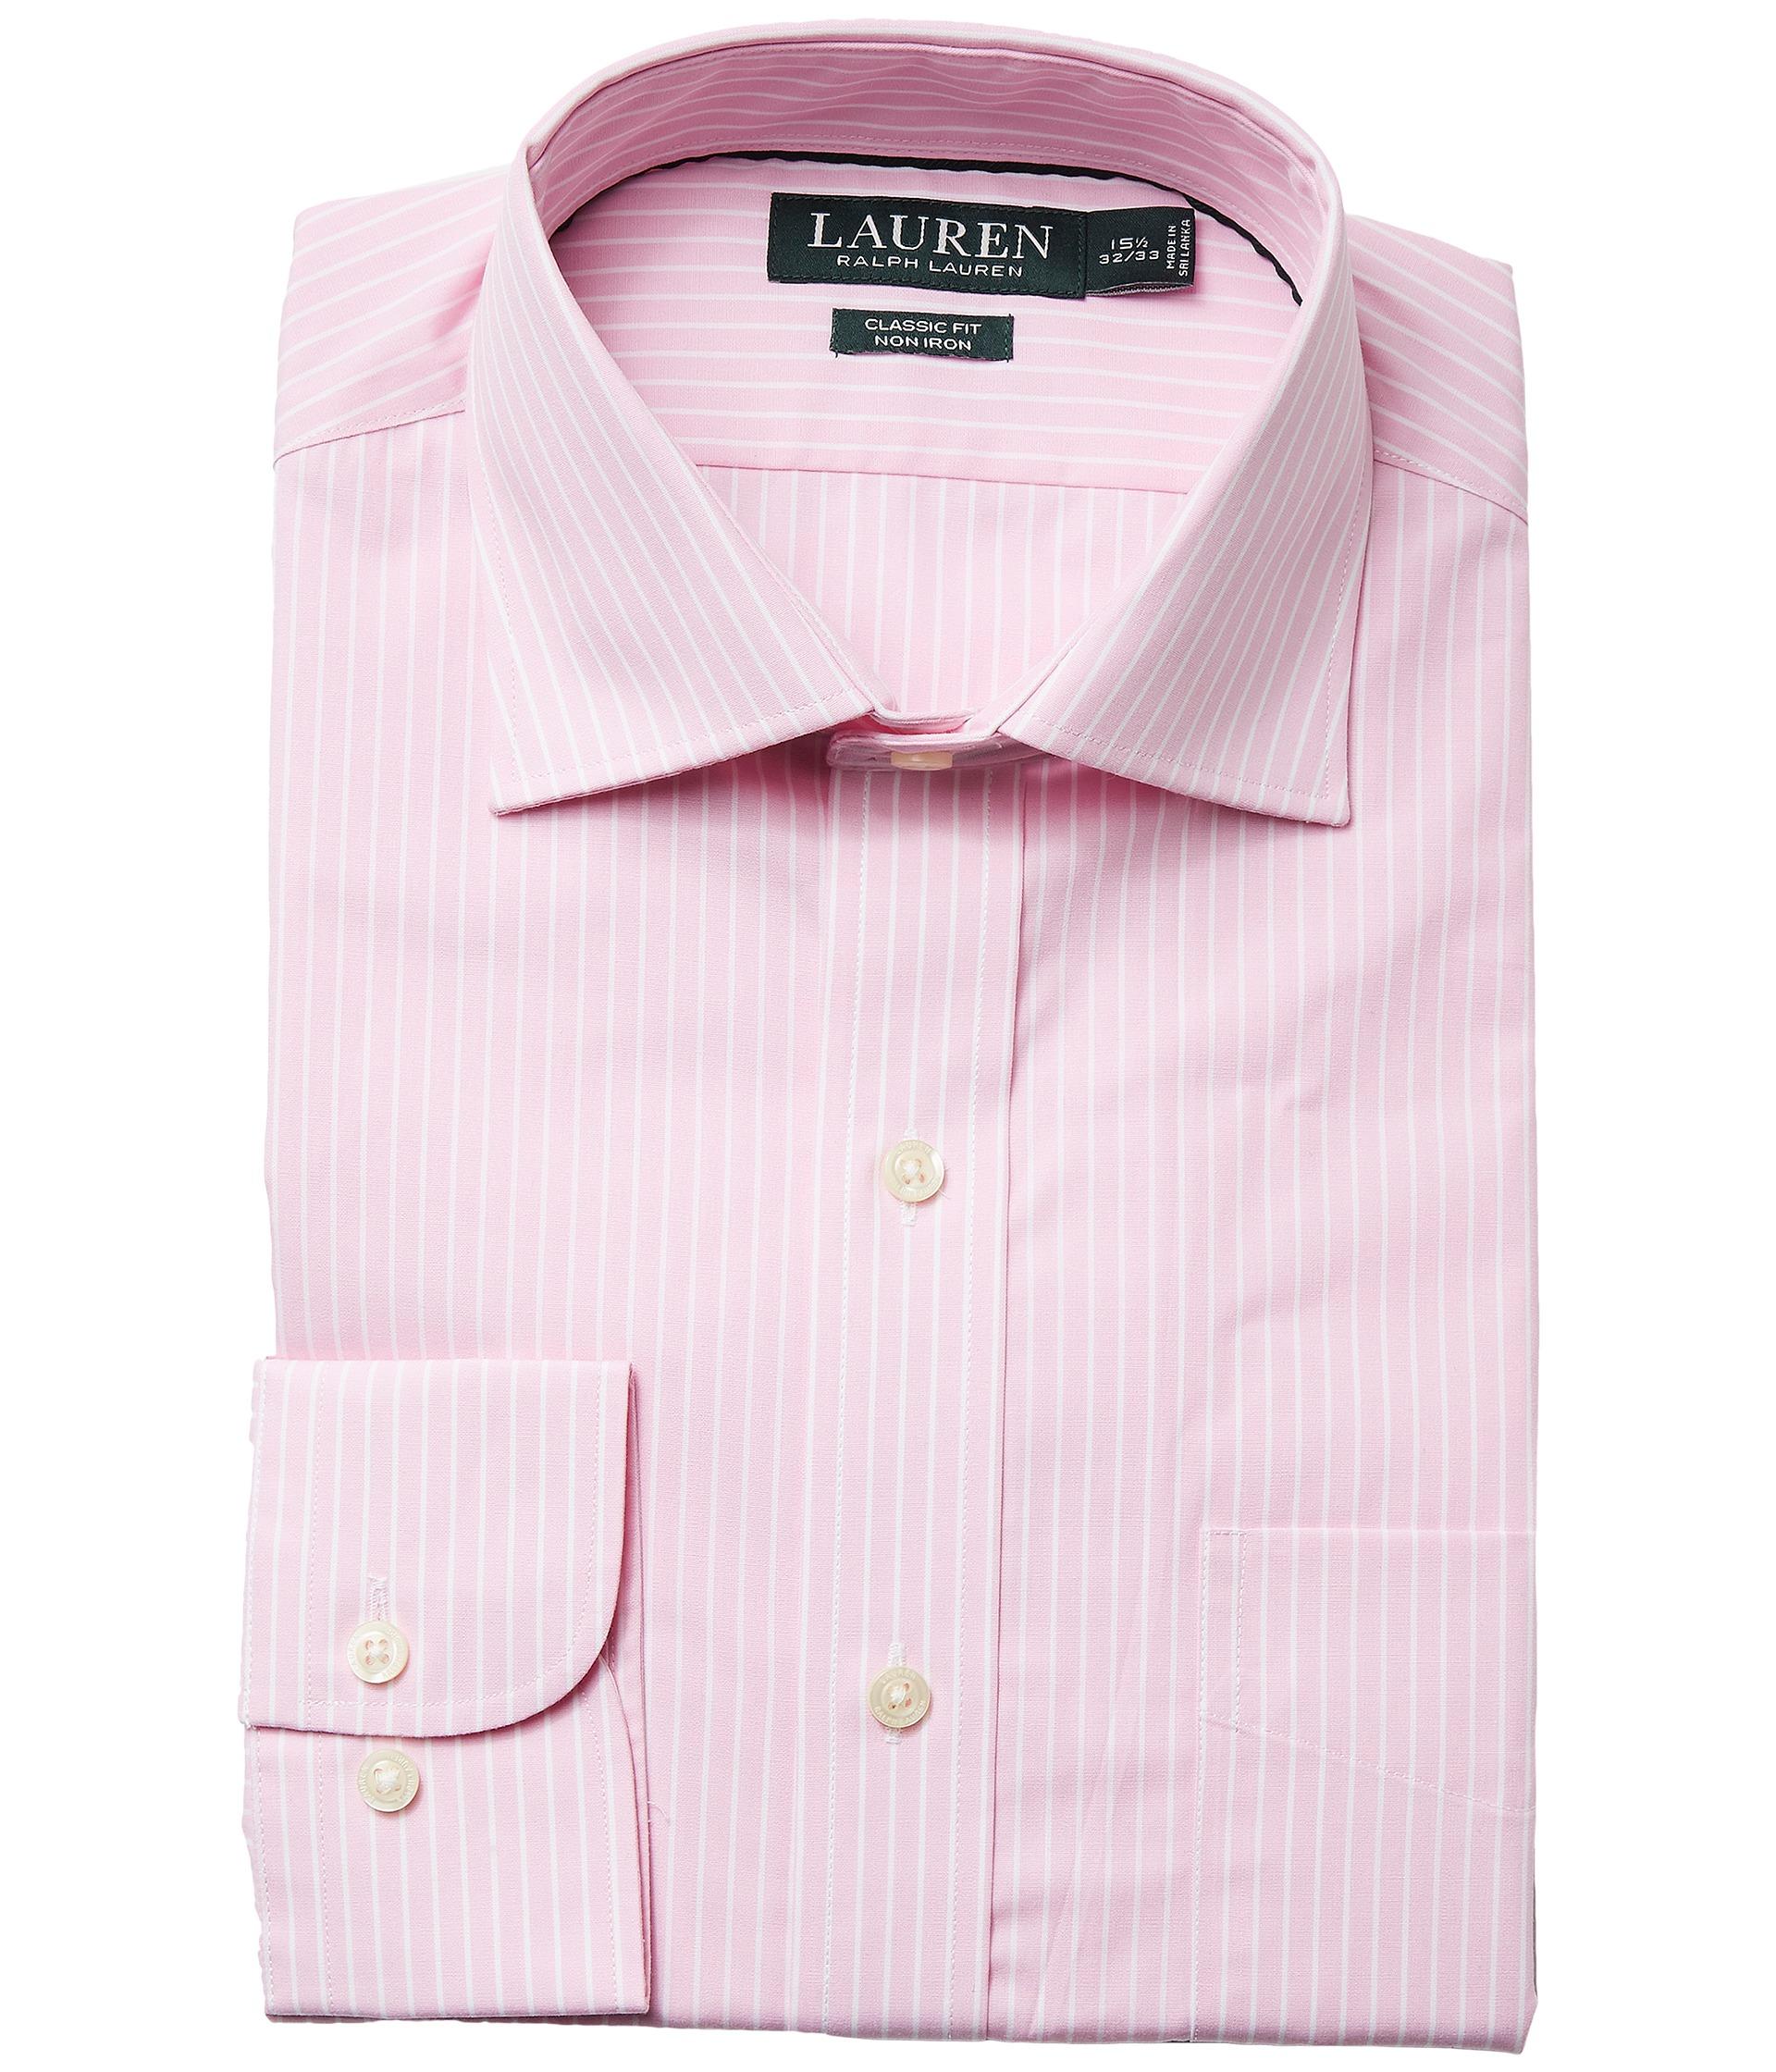 LAUREN Ralph Lauren Classic Fit Non Iron Poplin Stripe Spread Collar Dress Shirt